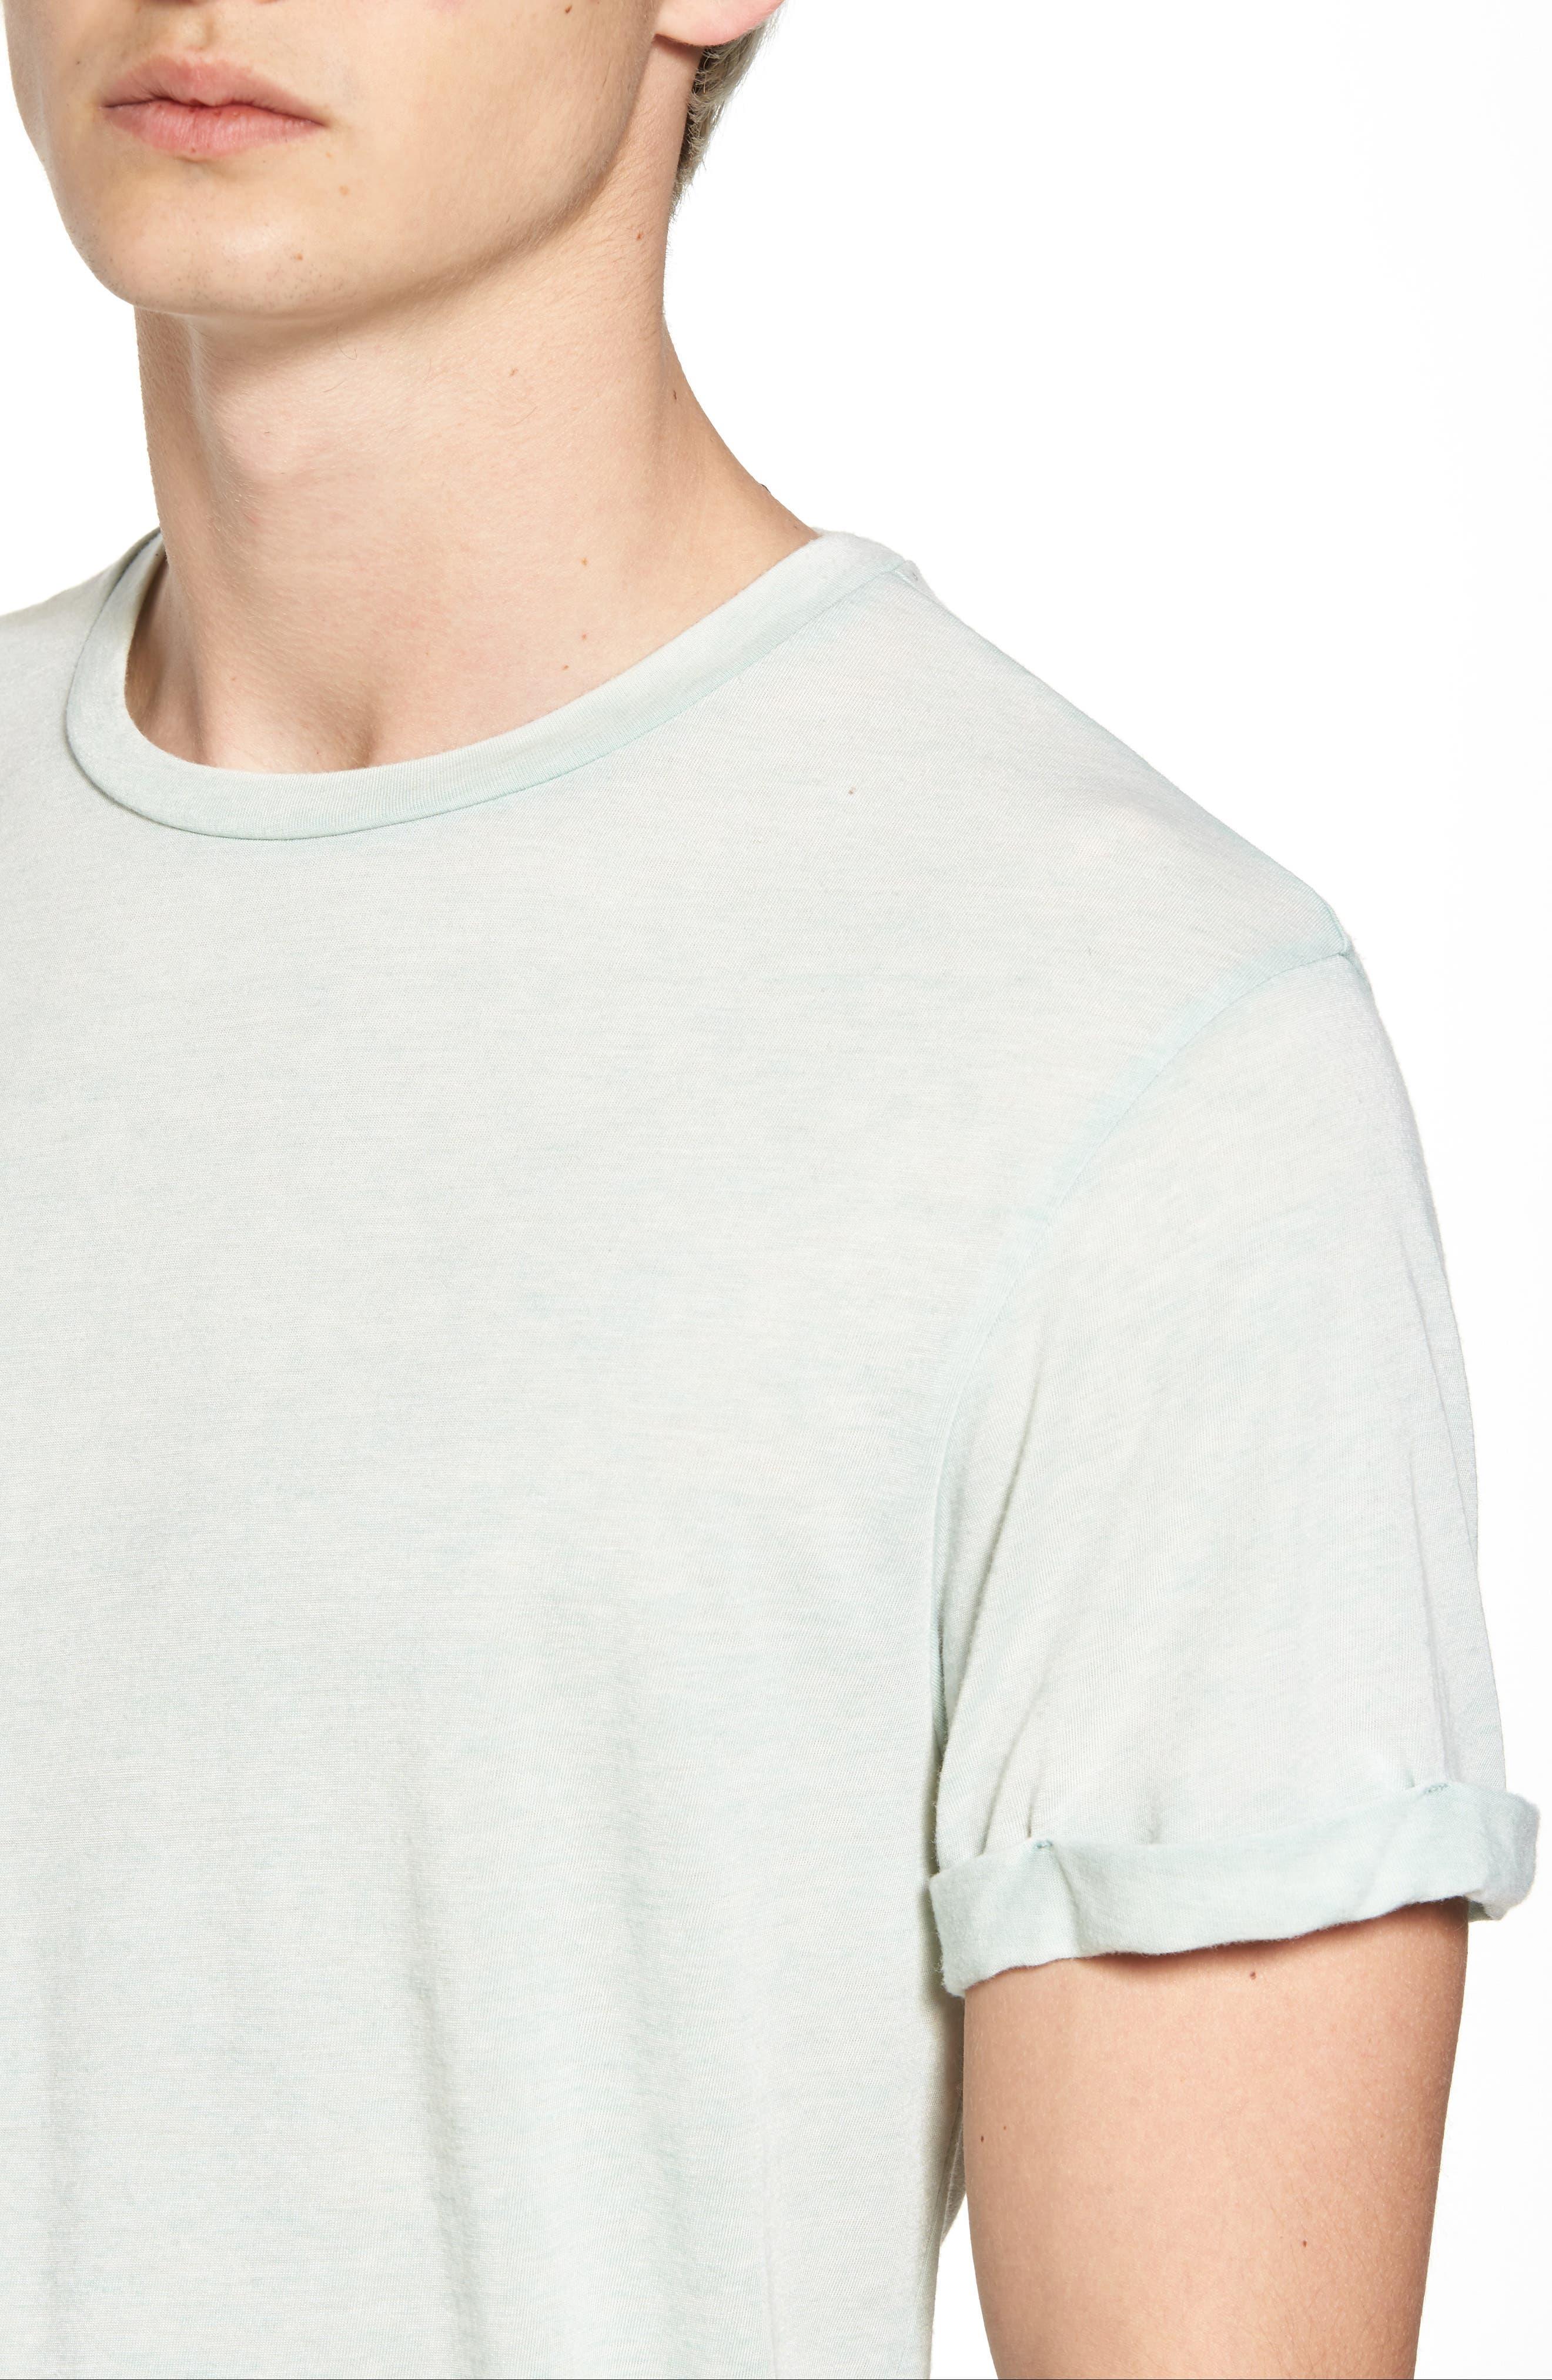 Ausbrenner T-Shirt,                             Alternate thumbnail 4, color,                             Seafoam Green Melange